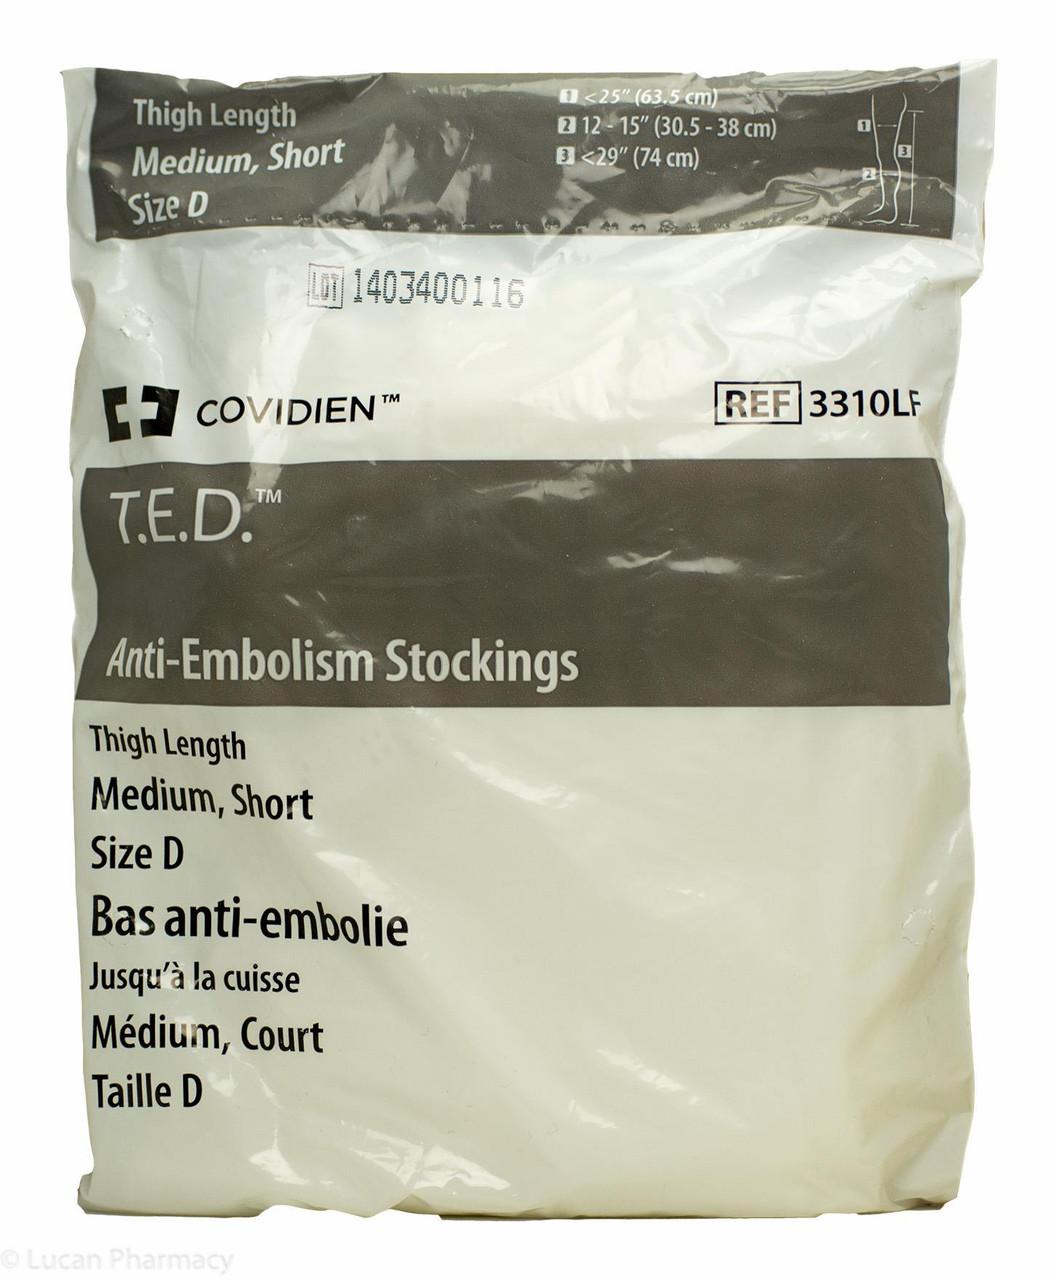 4b7ad9d121 T.E.D.® Anti-Embolism Stockings TED - Thigh Length Medium Short (Size D)